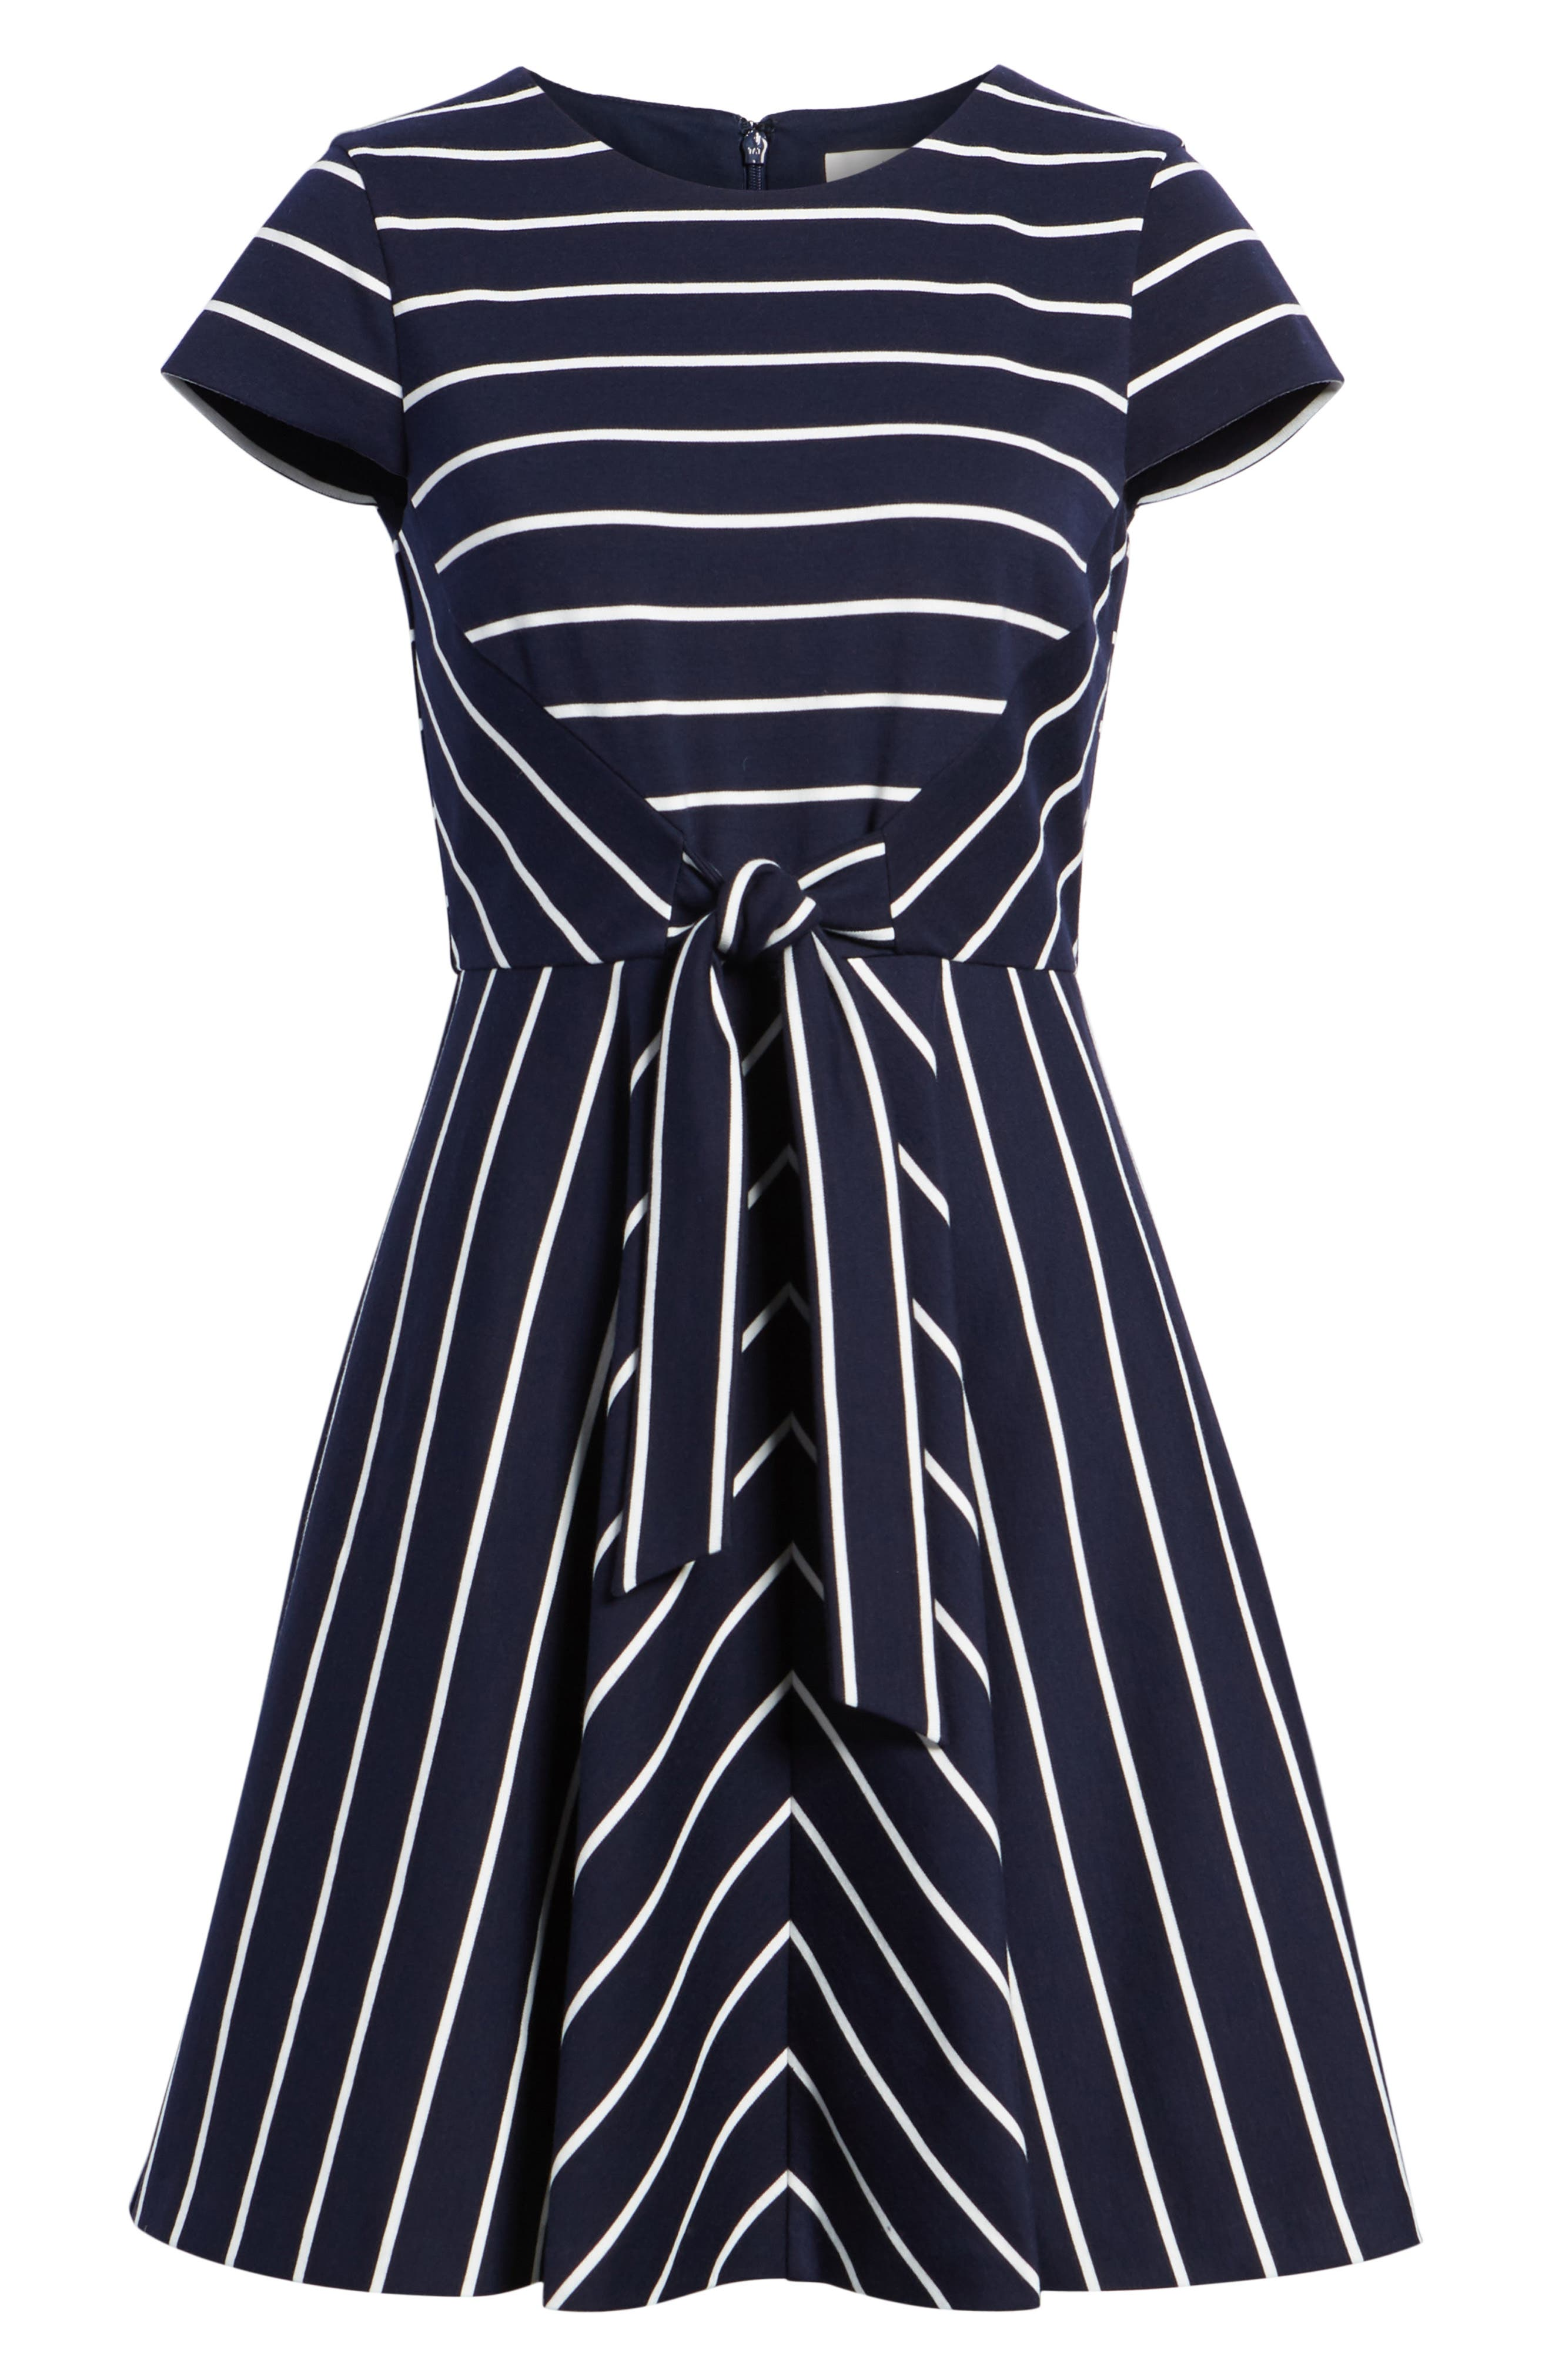 Stripe Ponte Fit & Flare Dress,                             Alternate thumbnail 7, color,                             Navy- White Stripe